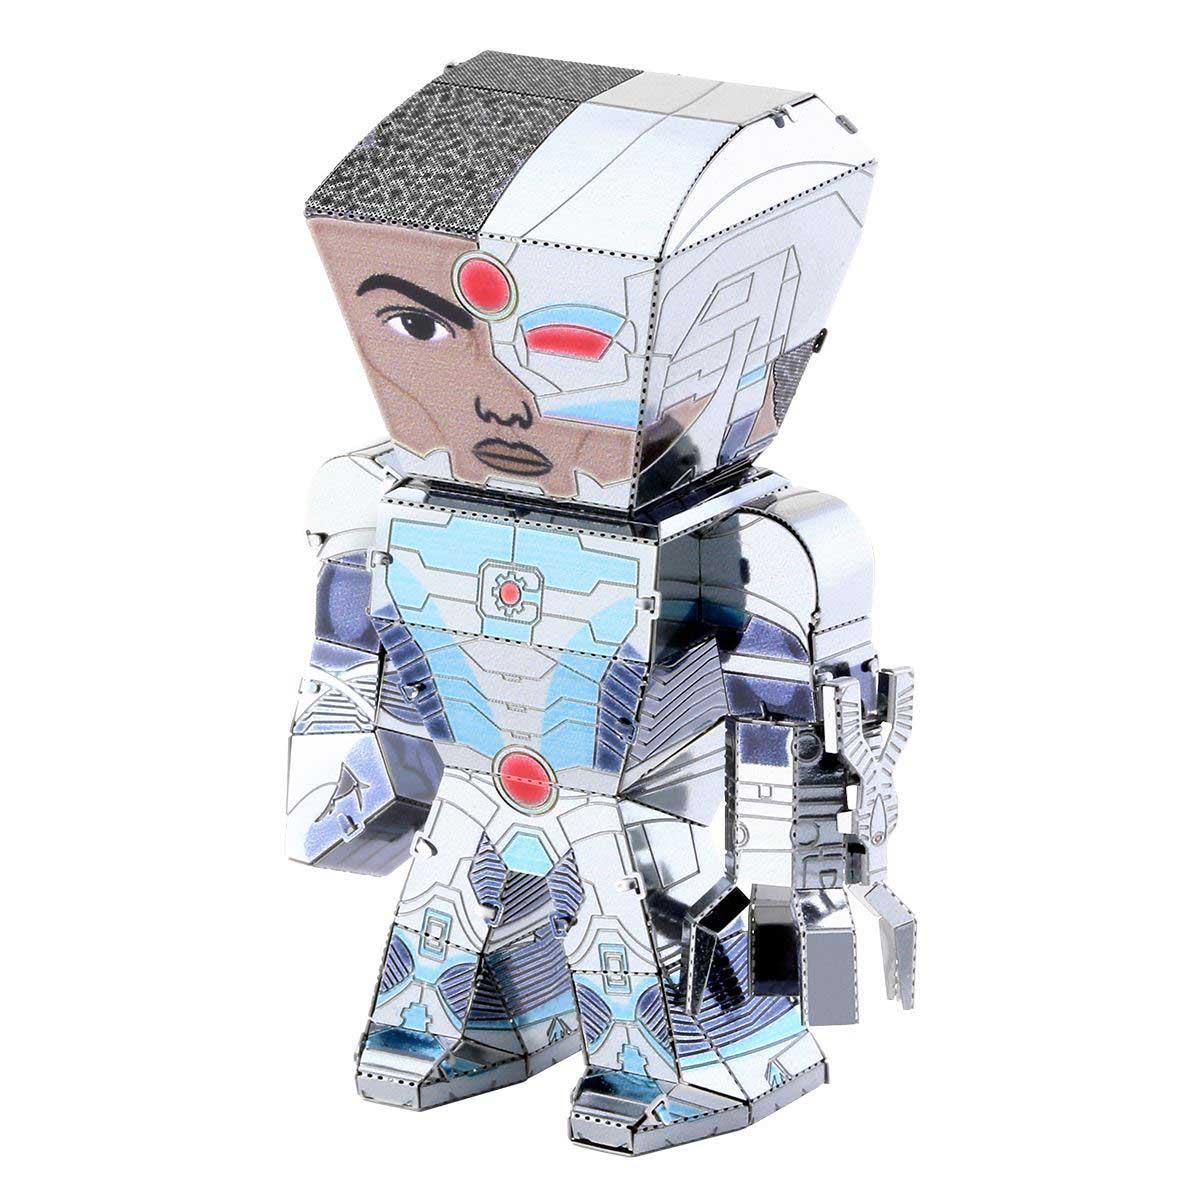 Cyborg Movies / Books / TV 3D Puzzle